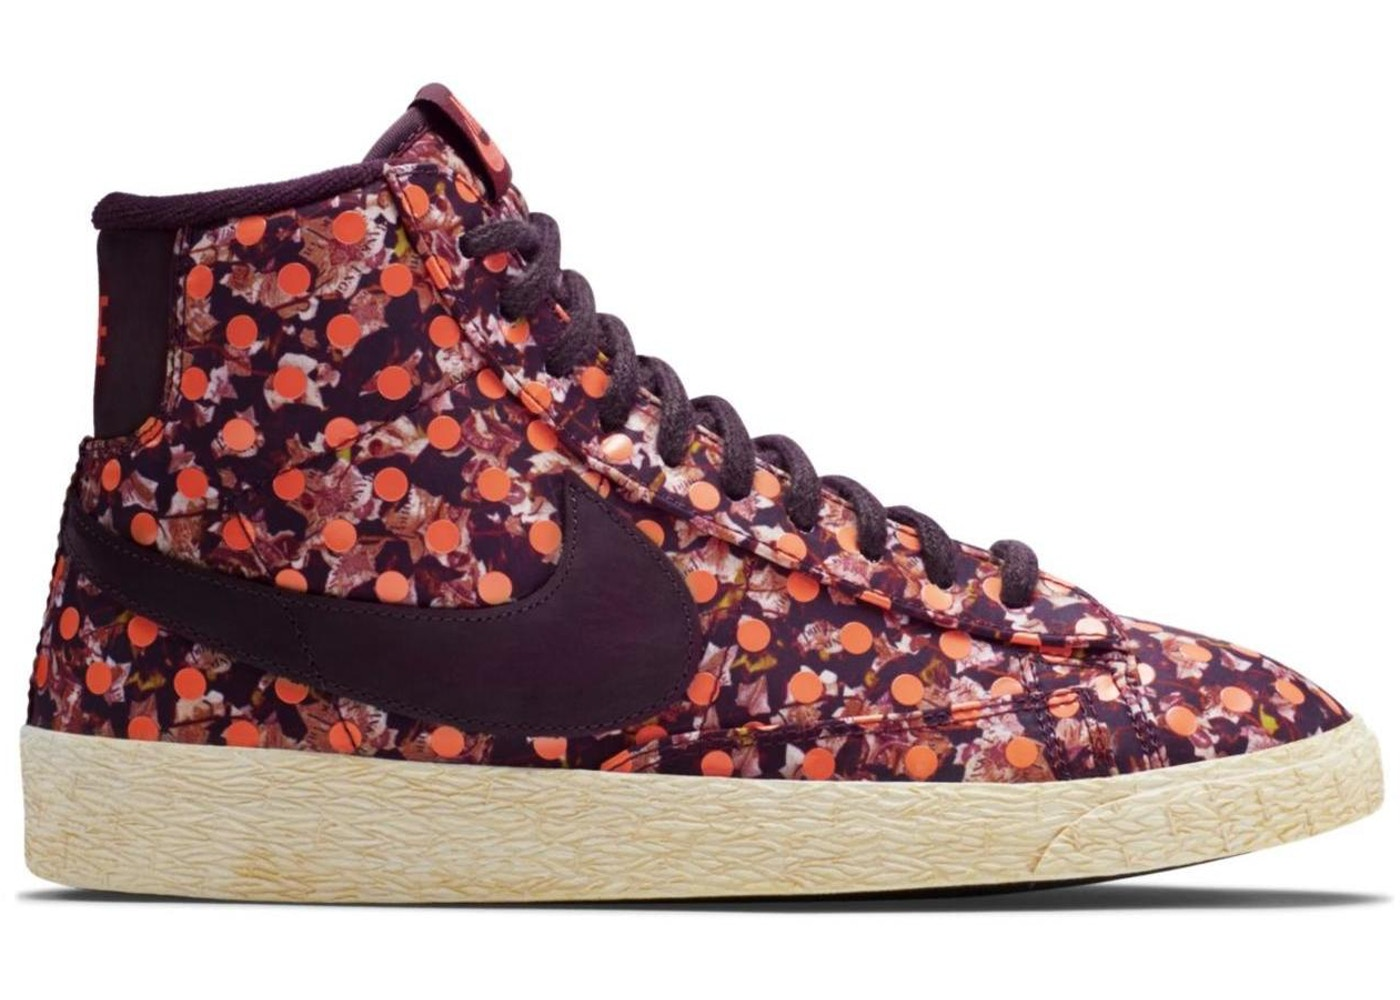 hot sale online 99b82 4c7c6 Nike SB Blazer Liberty Burgundy (GS) - 529037-600